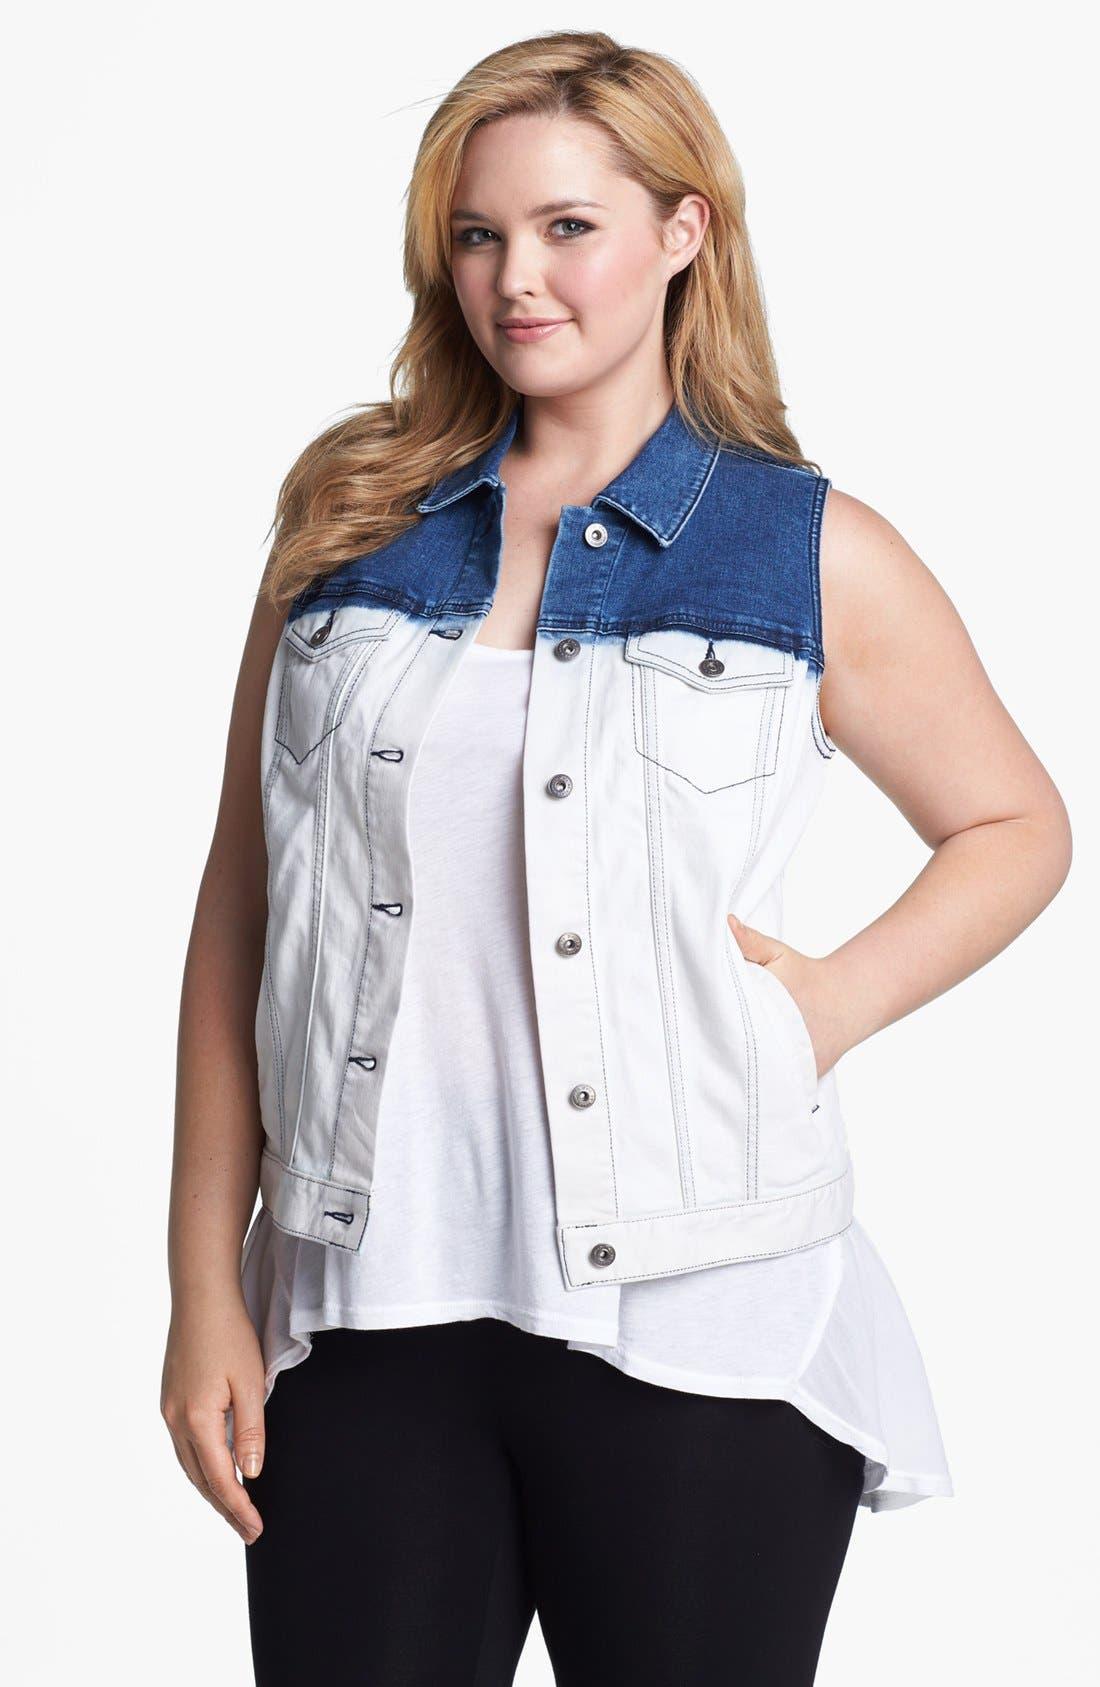 Main Image - Two by Vince Camuto Dip Dye Denim Vest (Plus Size)